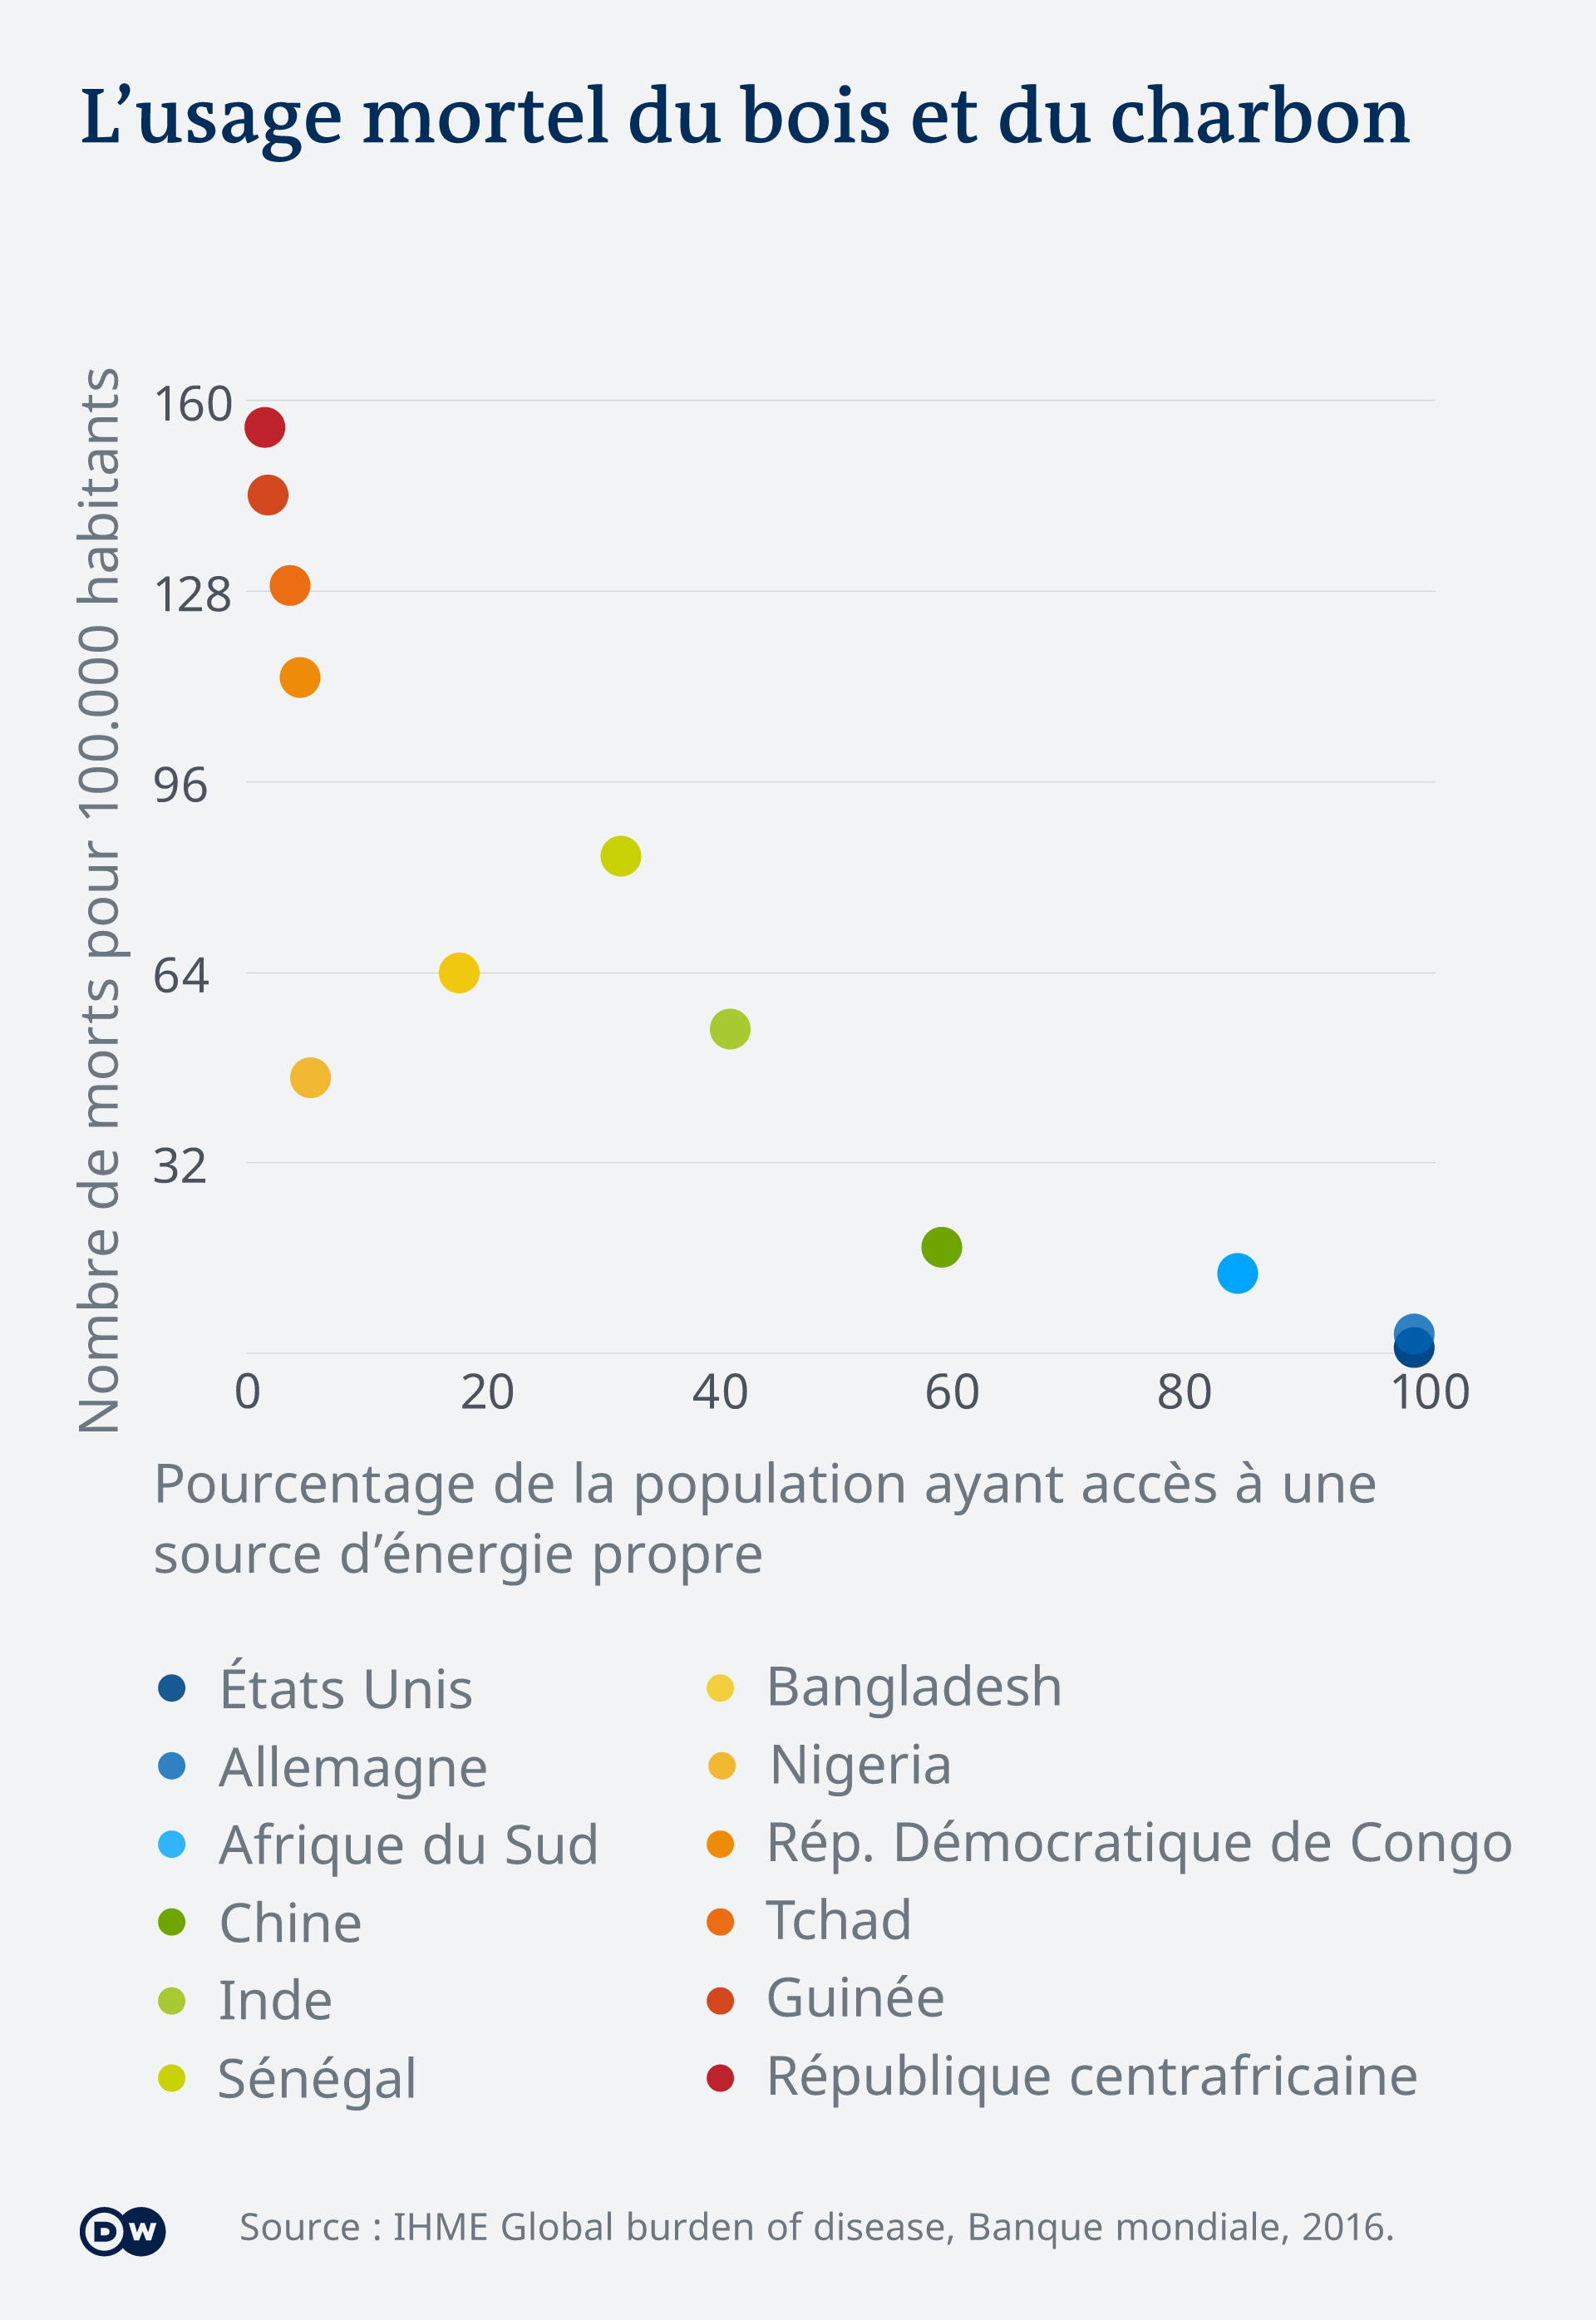 Infografik Luftverschmutzung Vergleich Zugang saubere Energie Gestorbene FR